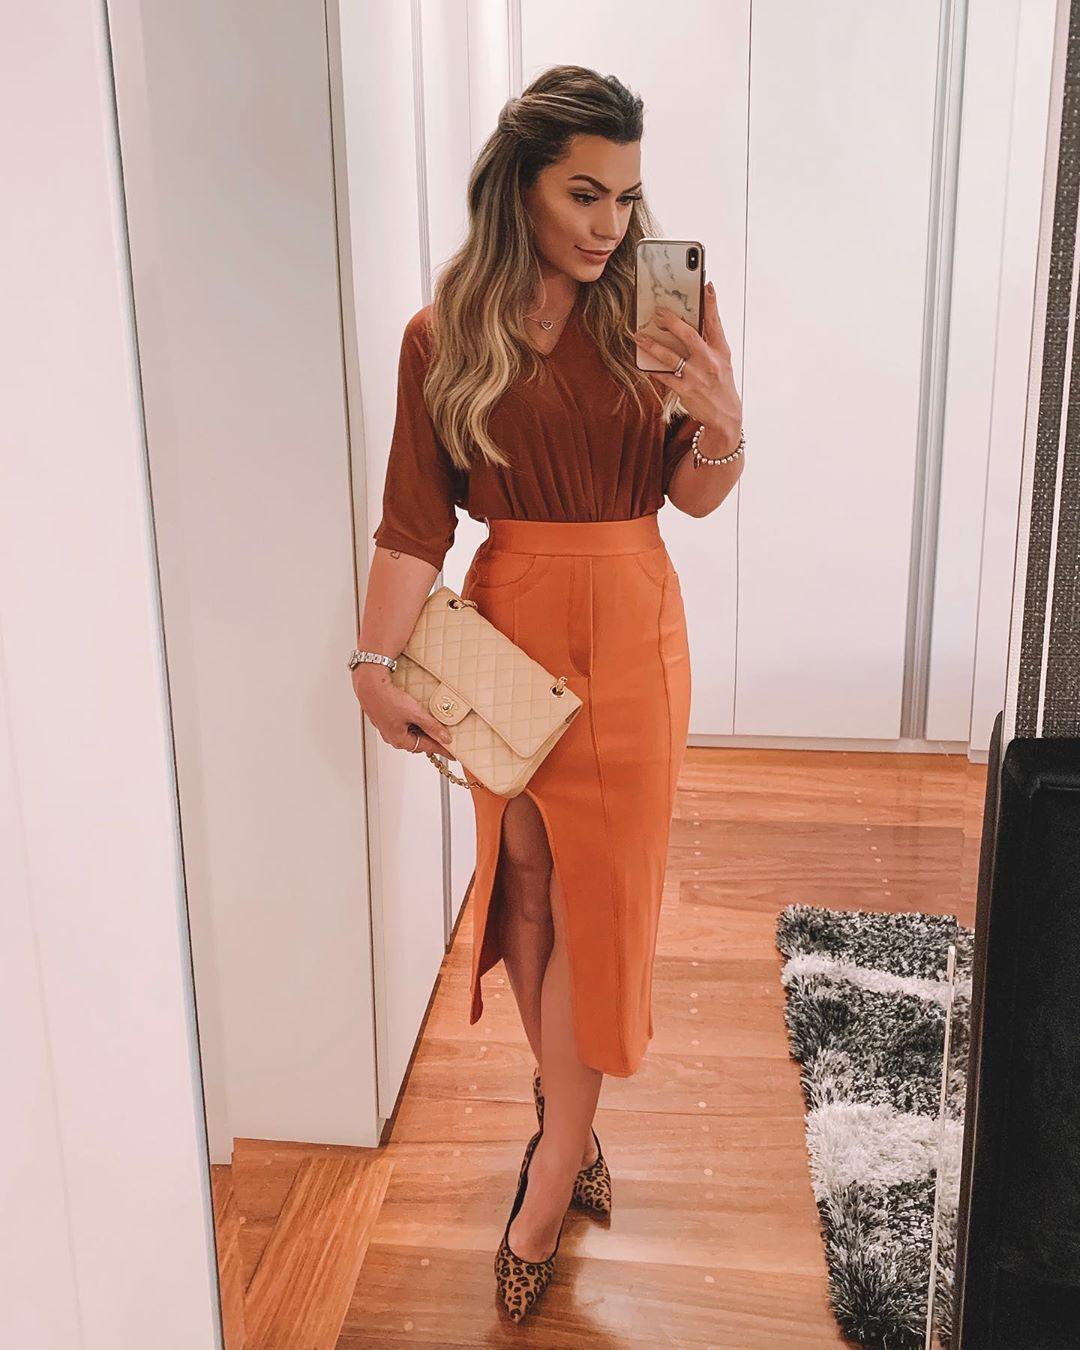 Pin em Outfit Goals